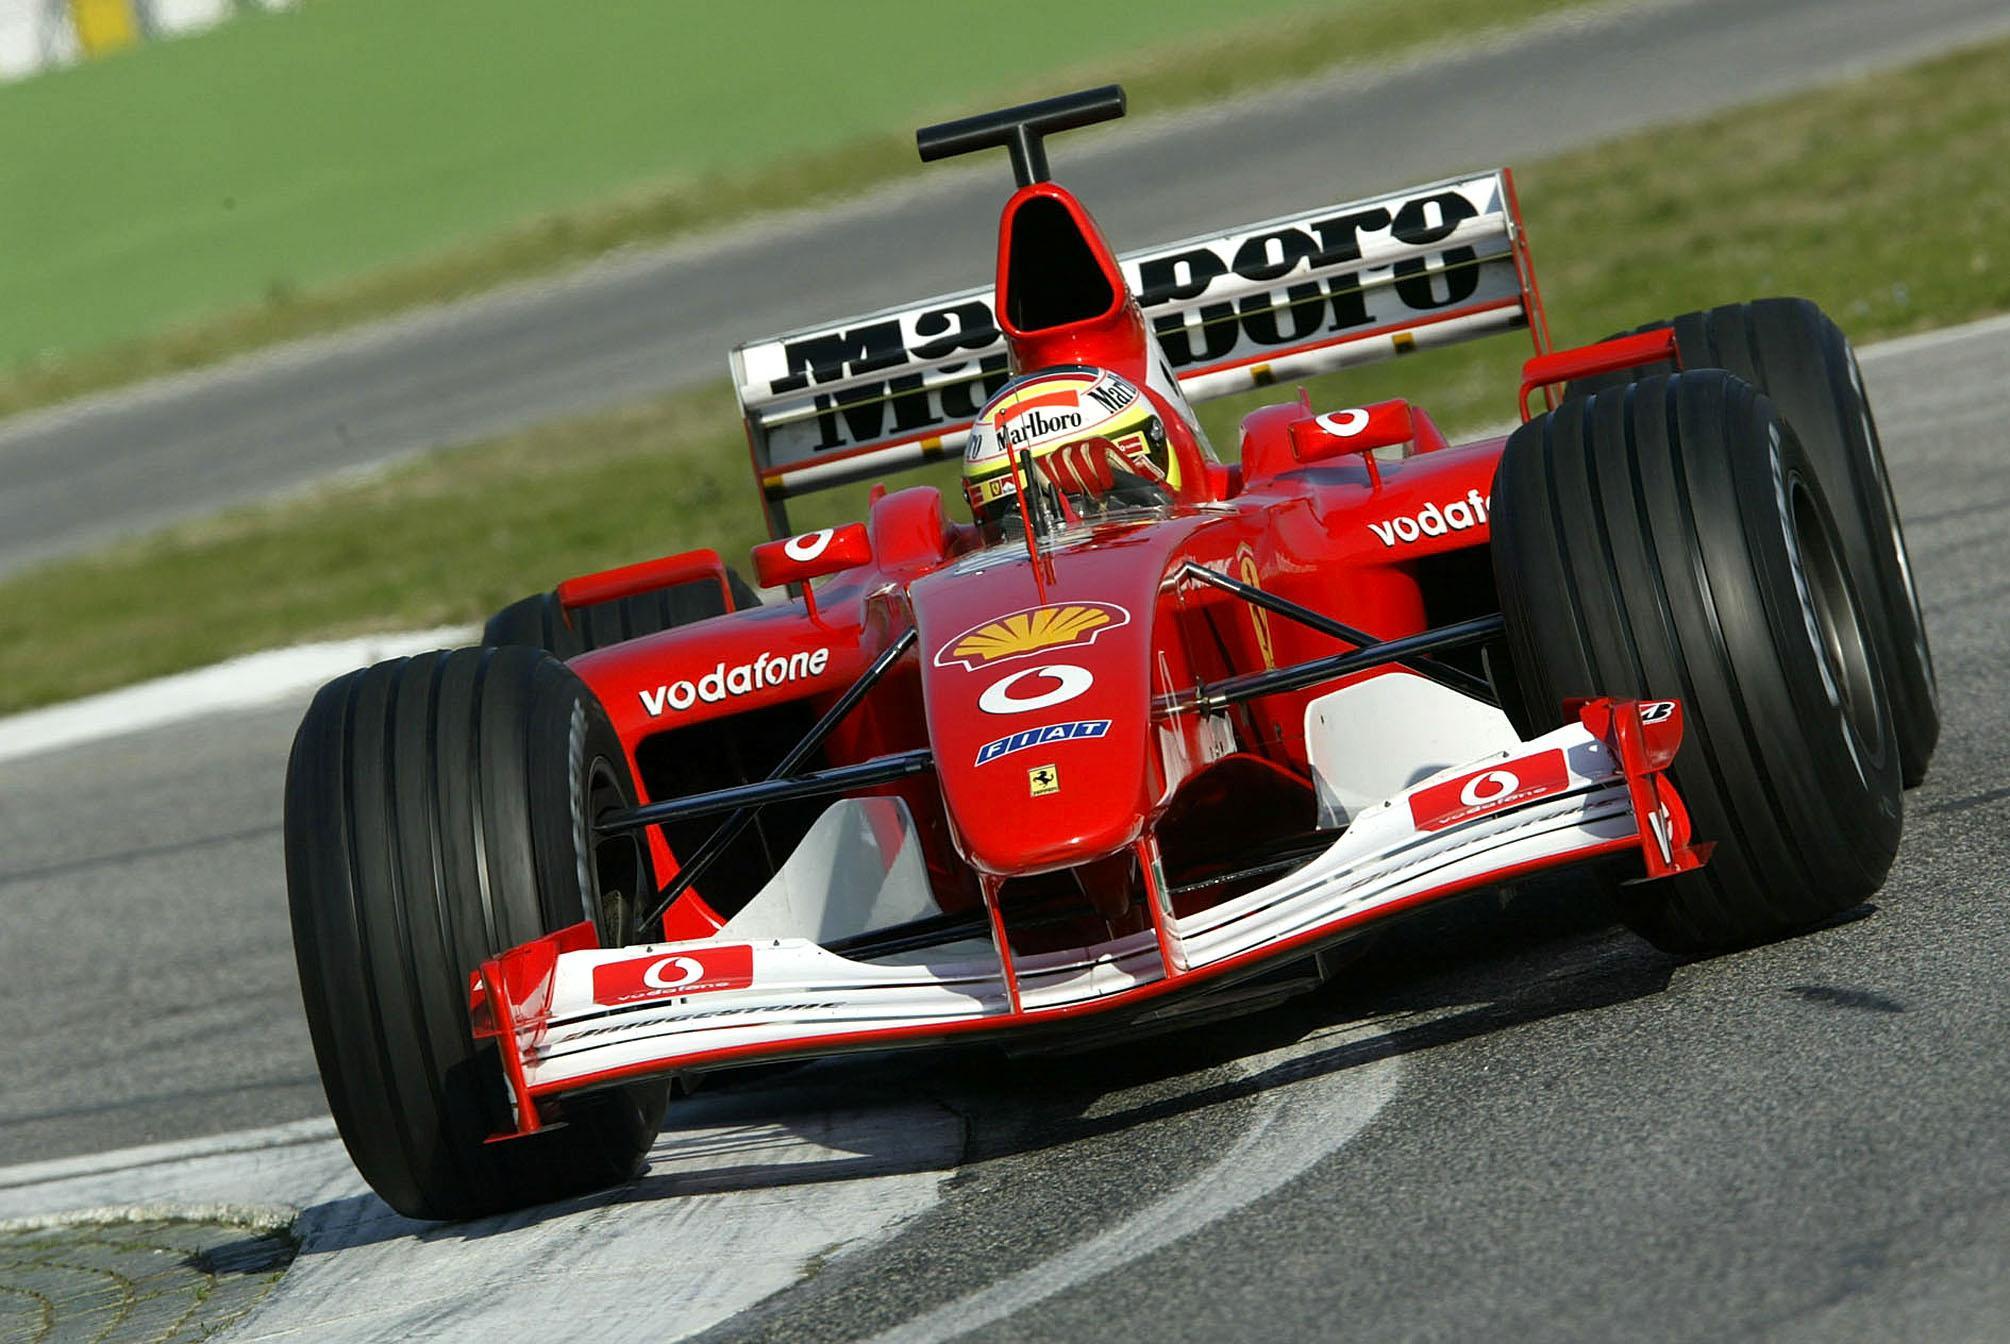 2002 Ferrari F2002 Image Http Www Conceptcarz Com Images Ferrari 2002 Ferrari F2002 F1 Image